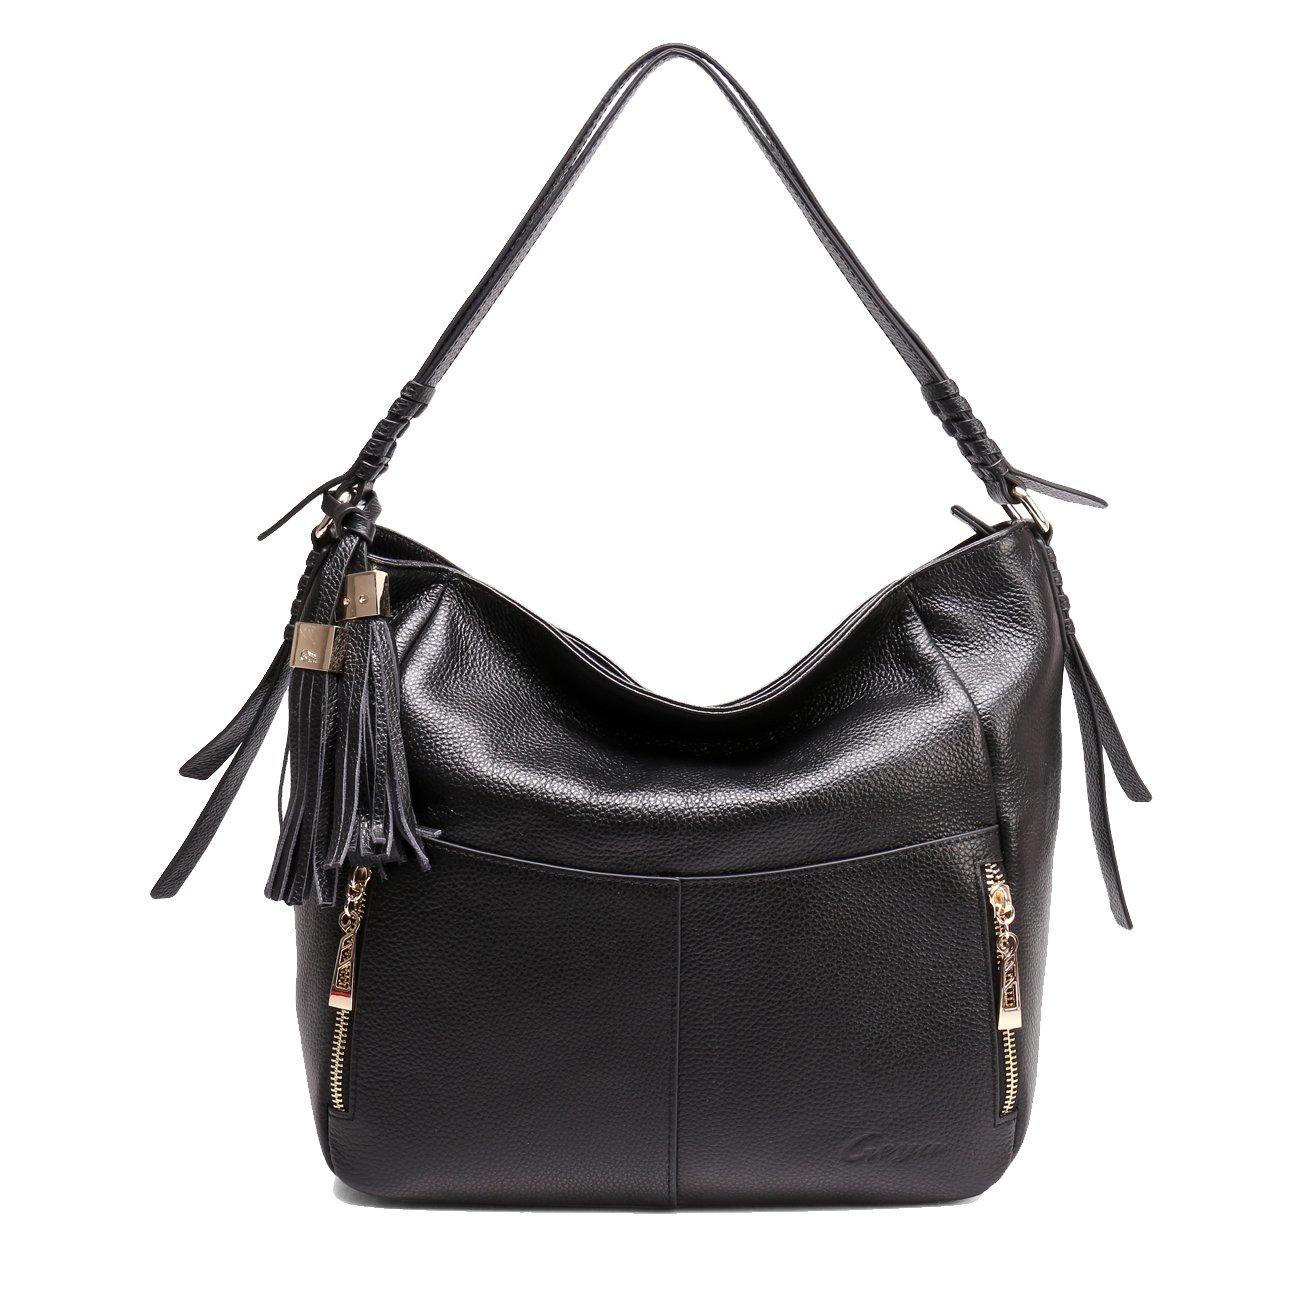 Geya Women's Fashion Genuine Leather Handbag Shoulder Handbag with Imported Soft Hot Leather (Black) by Geya (Image #2)